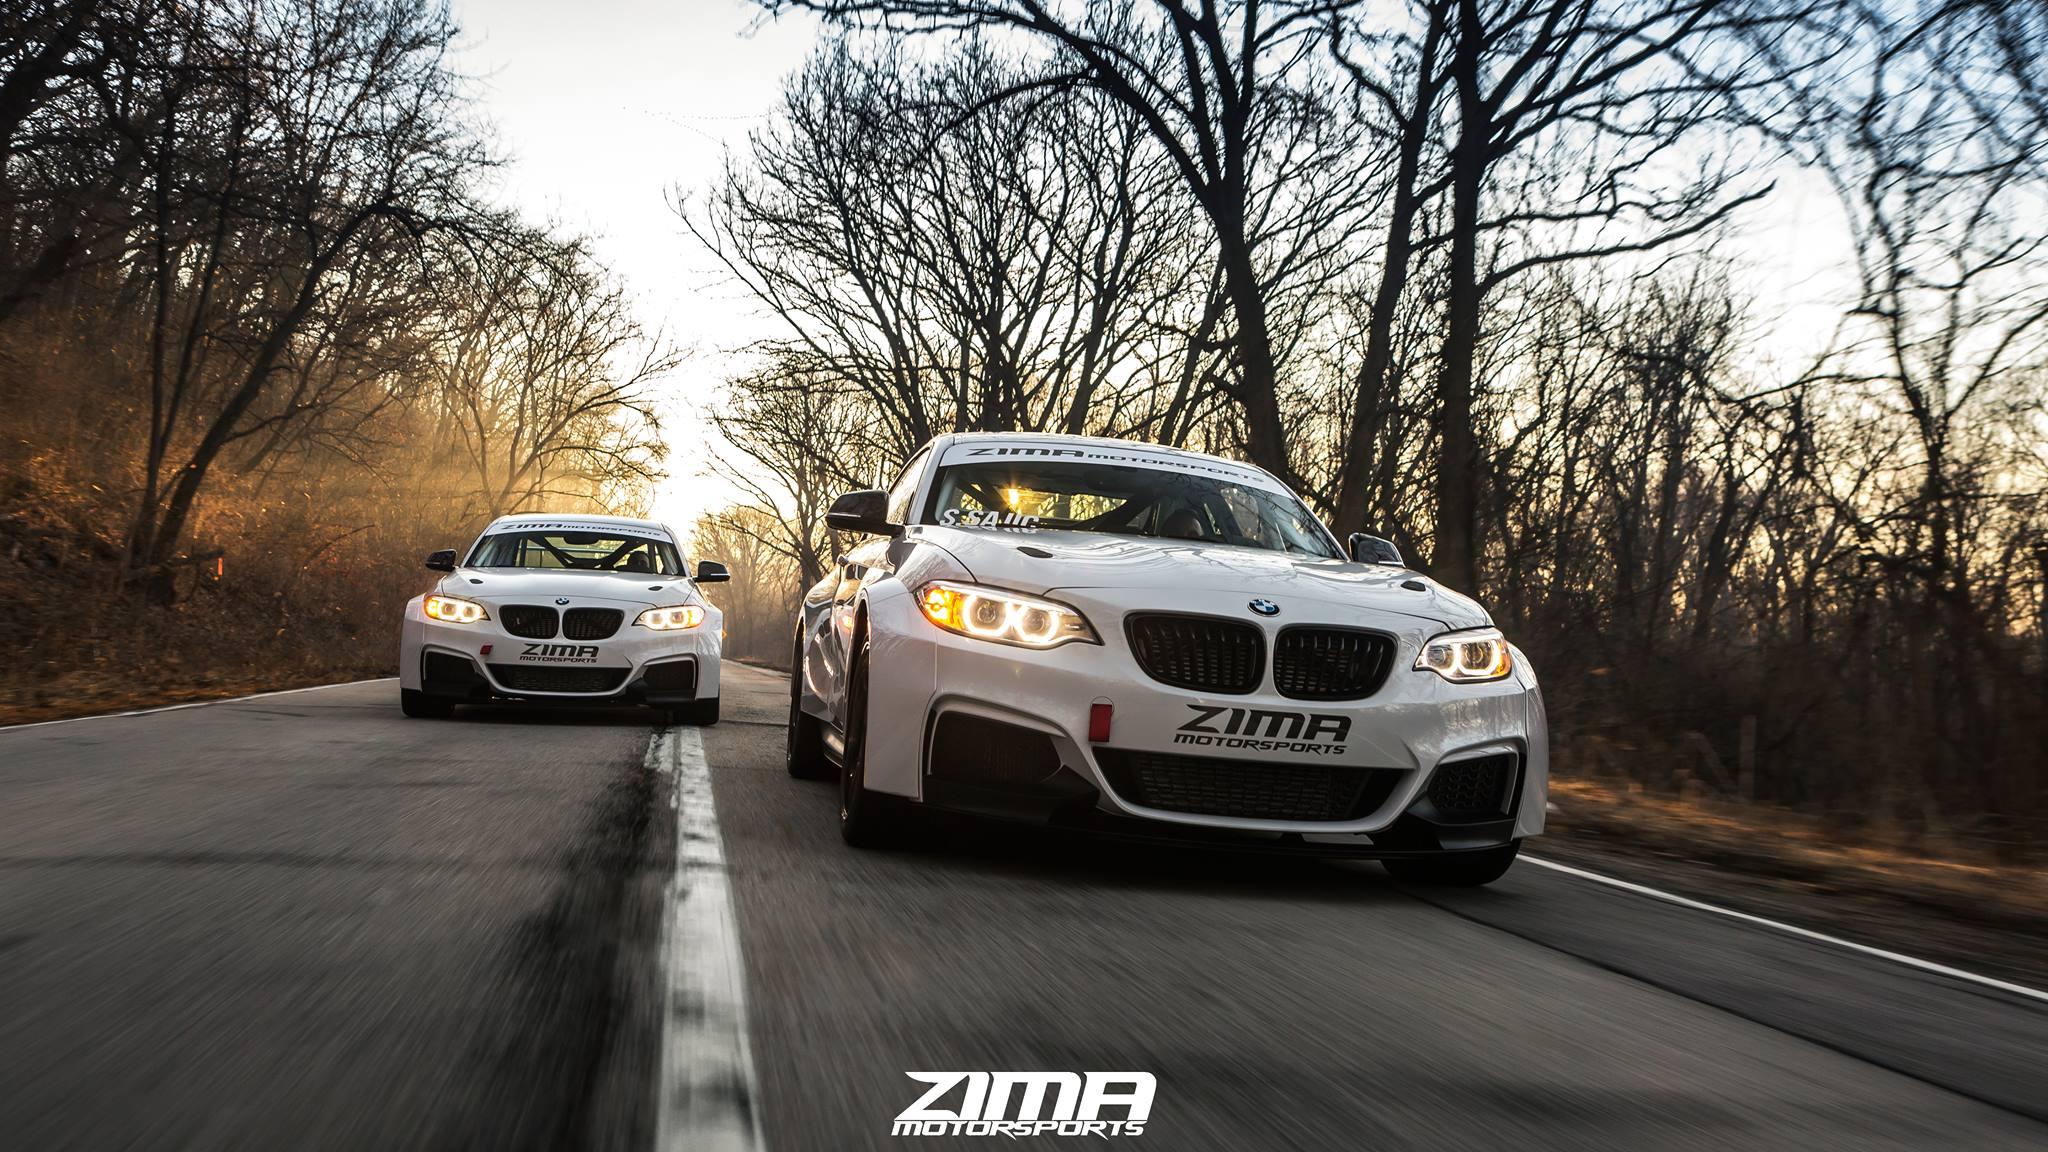 ZIMA BMW M235i racing